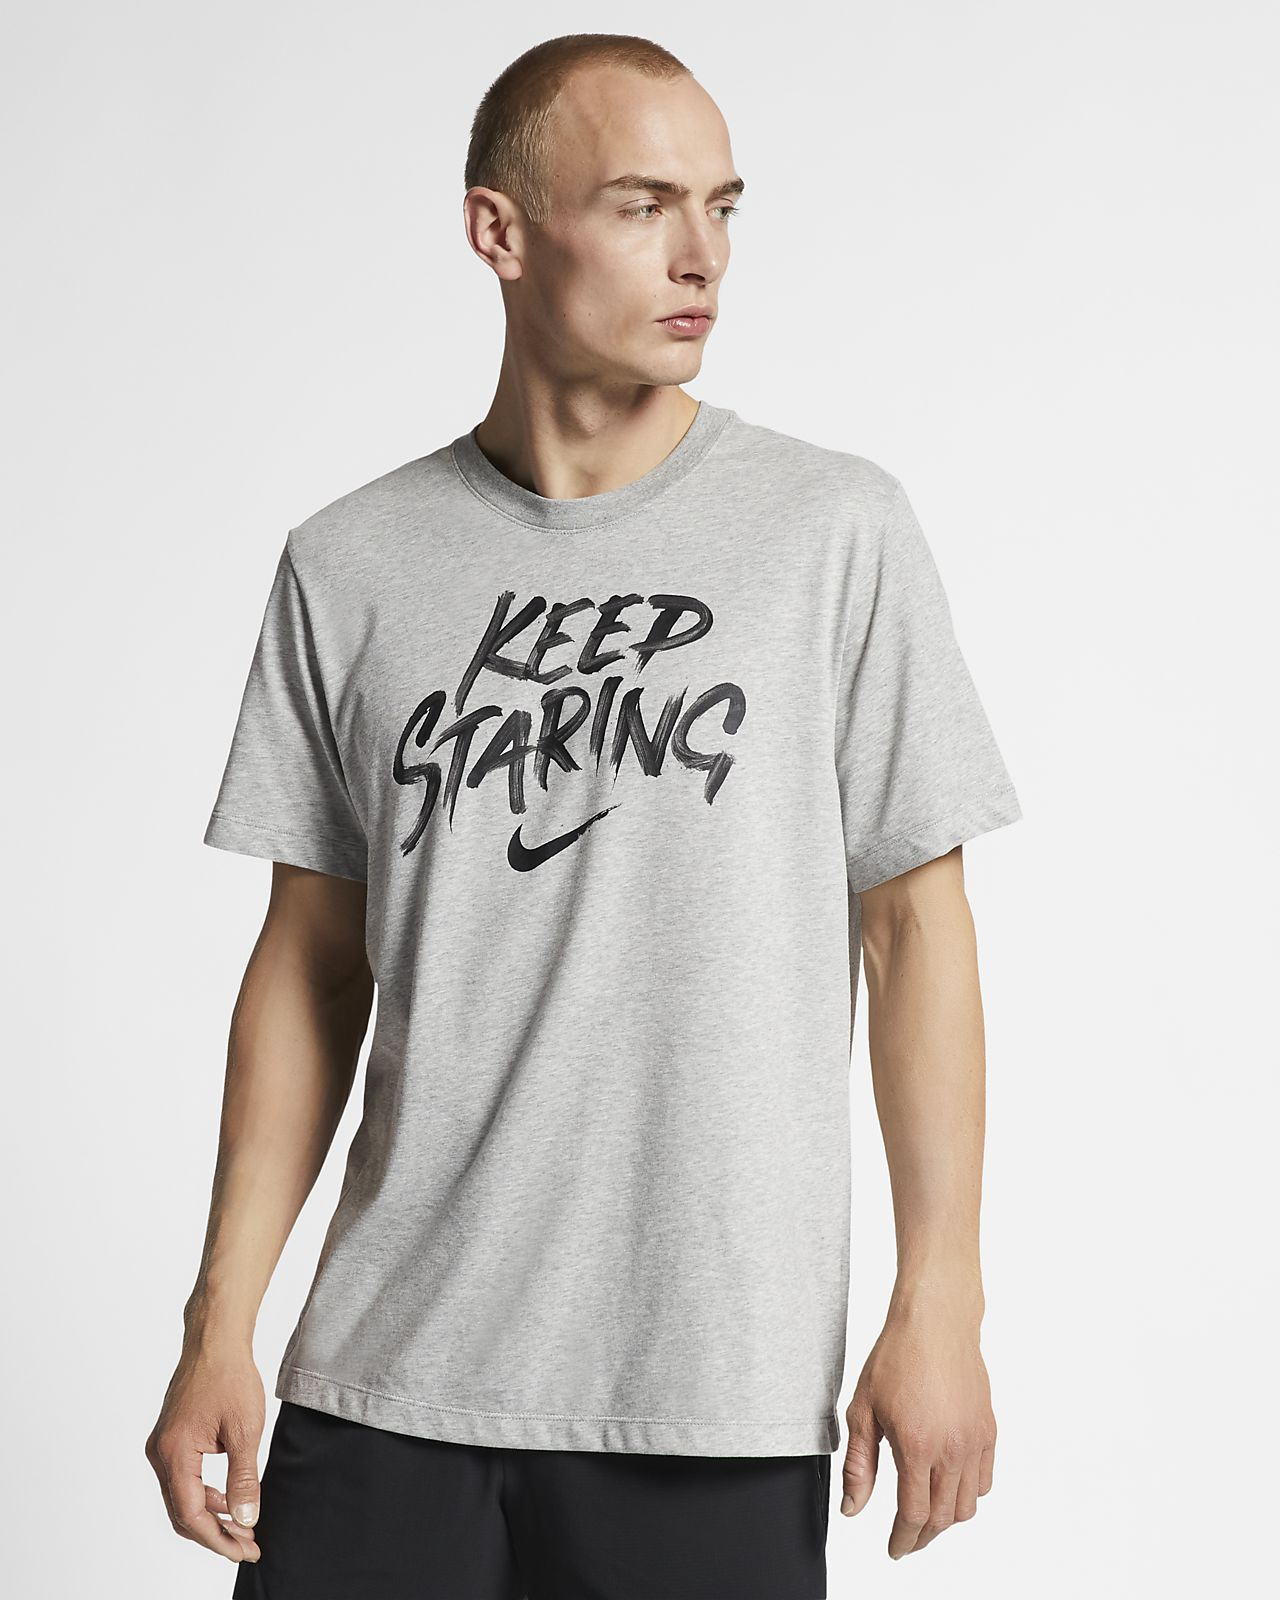 a0318413 Nike Dri-FIT trenings-T-skjorte til herre. Nike.com NO